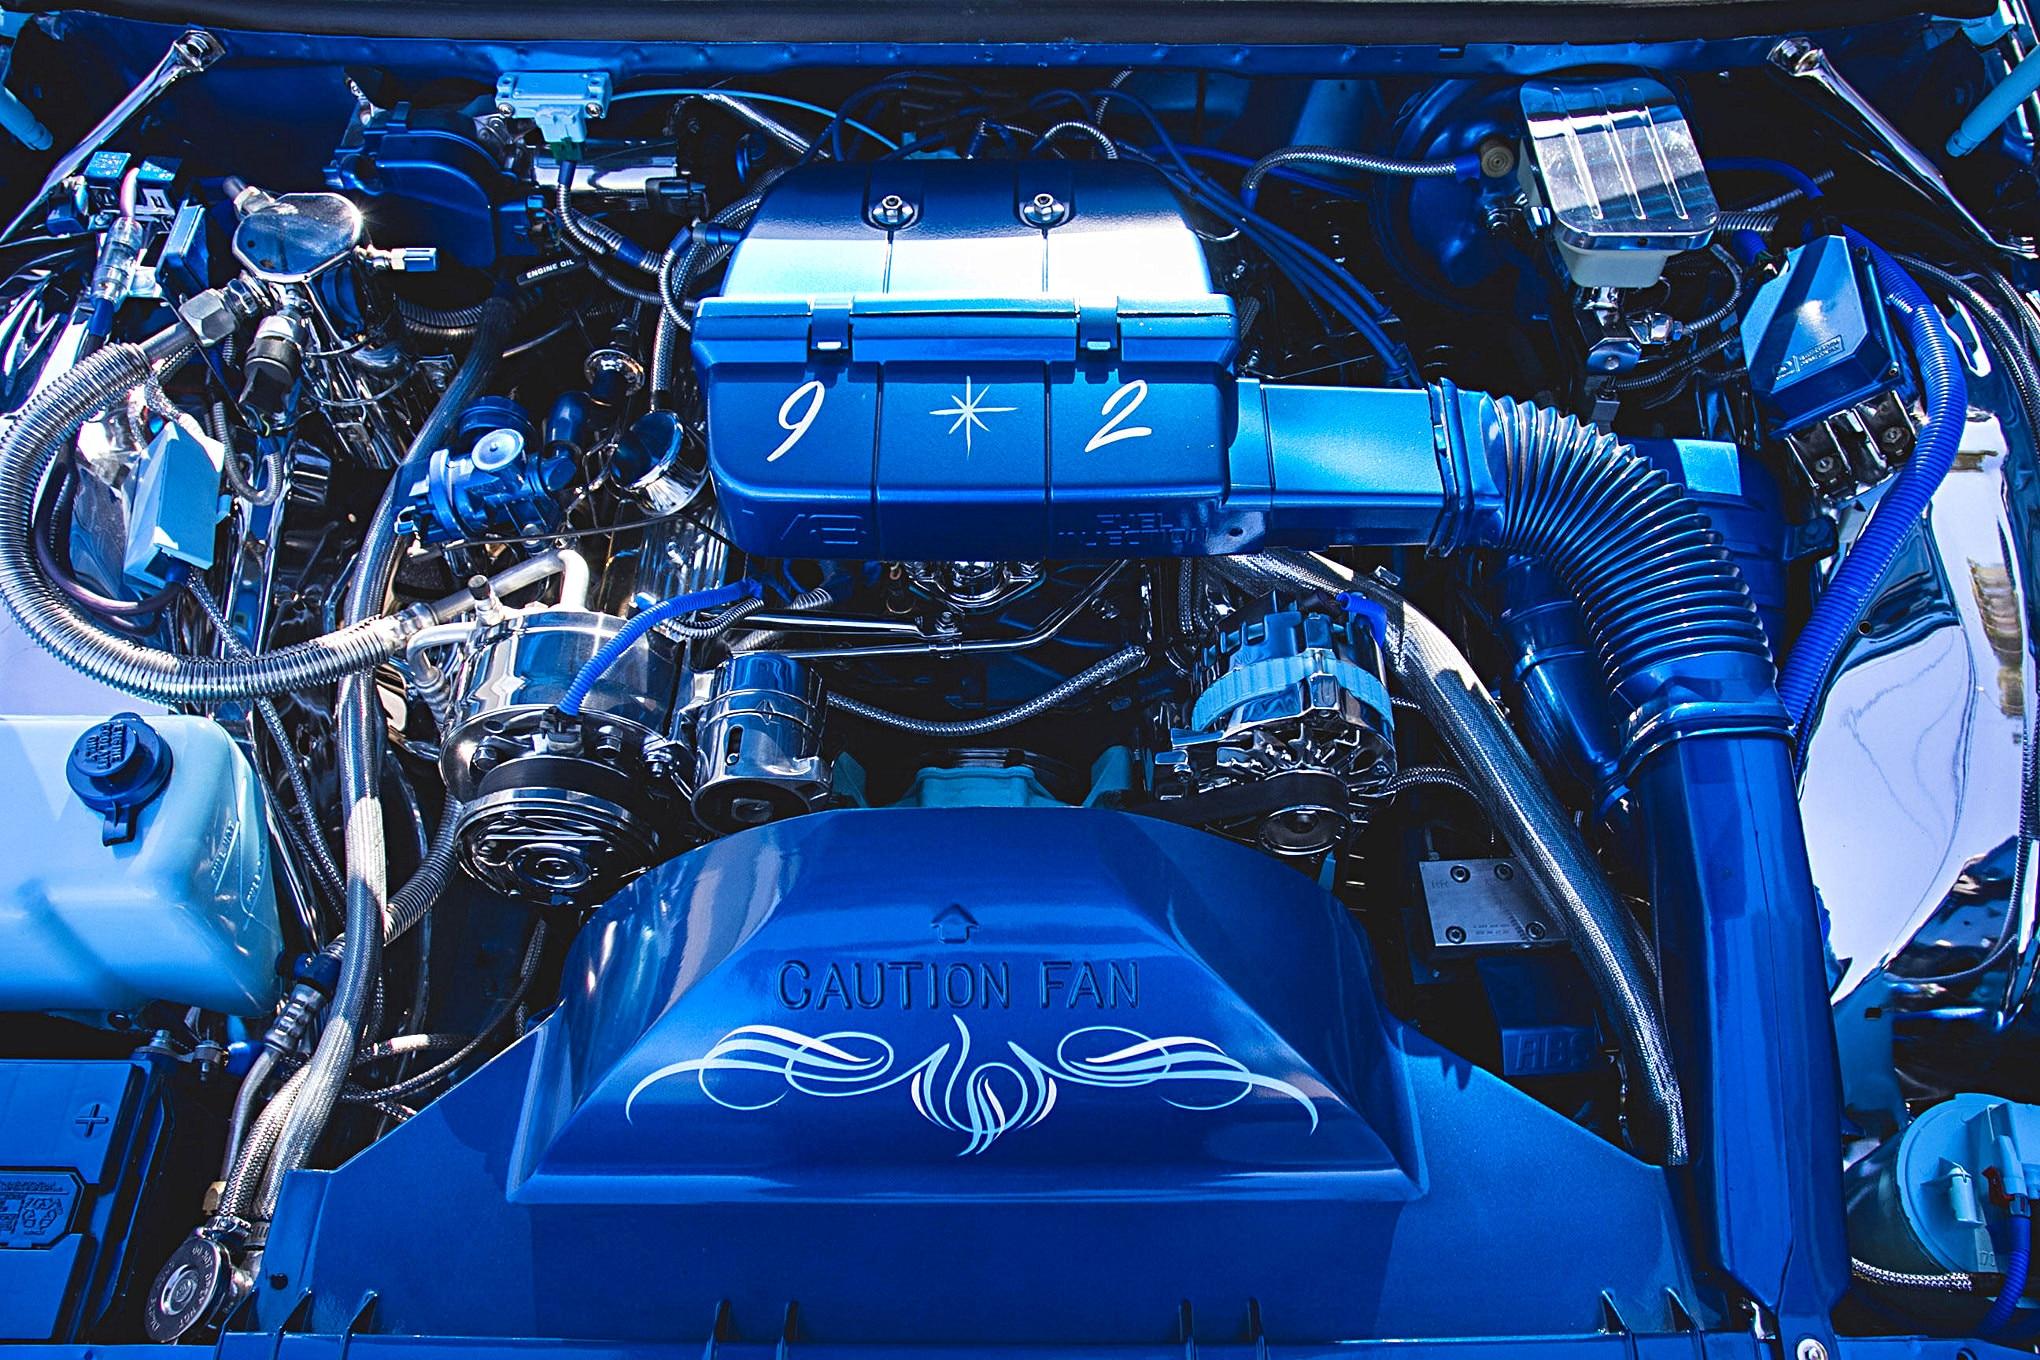 1992 chevrolet caprice chevy 305 engine - Lowrider